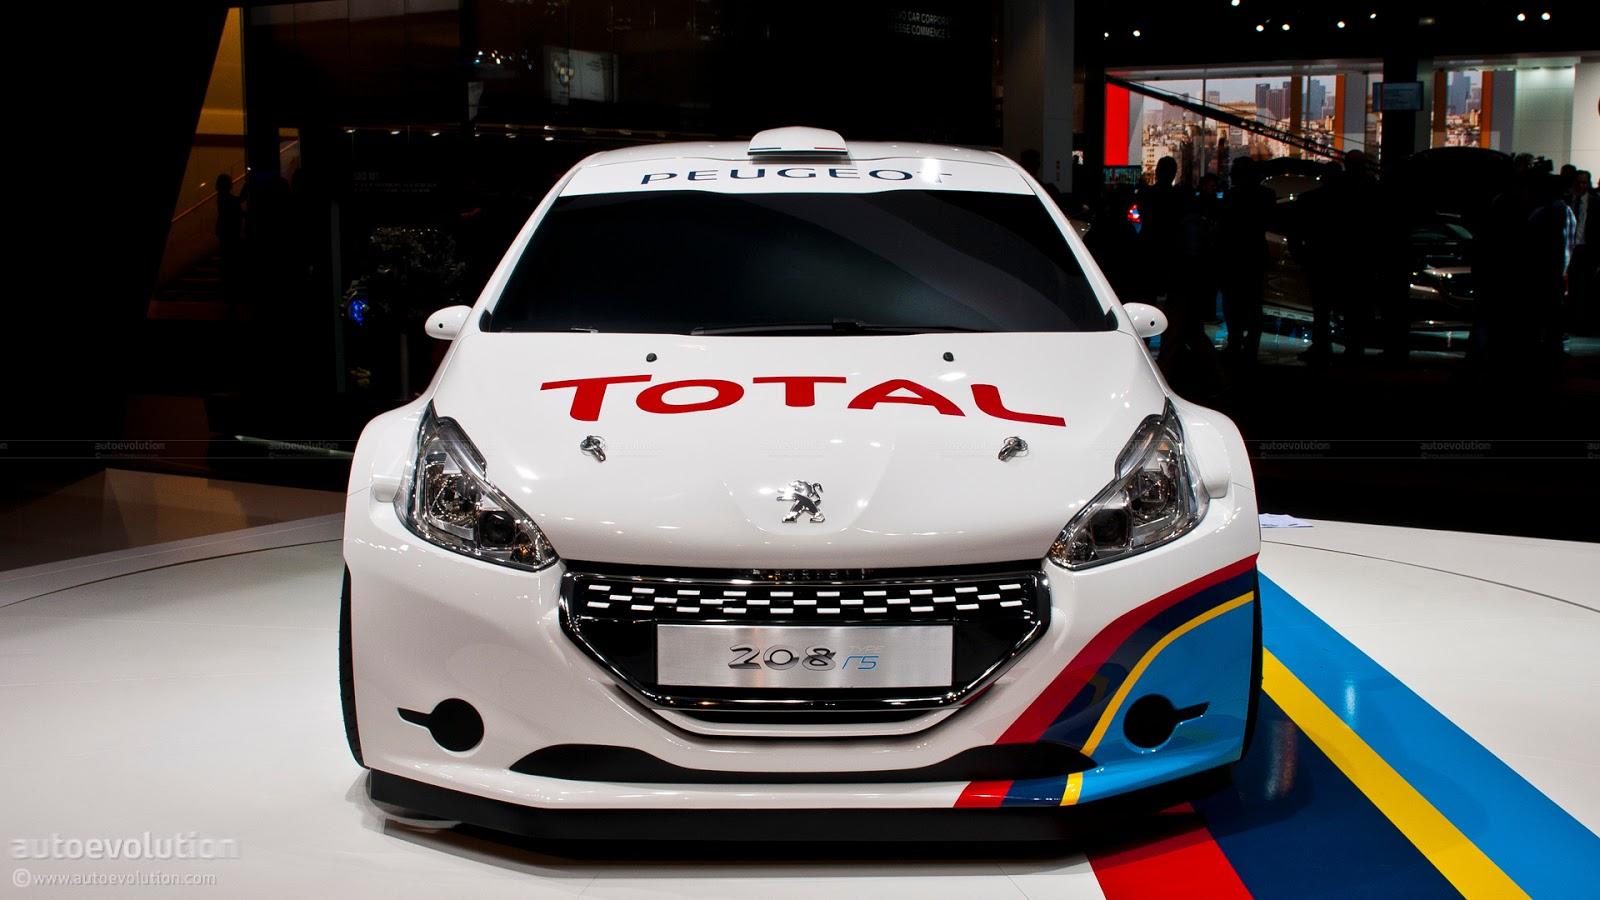 All Car Logos: 2013 Peugeot 208 R5 Rally Car